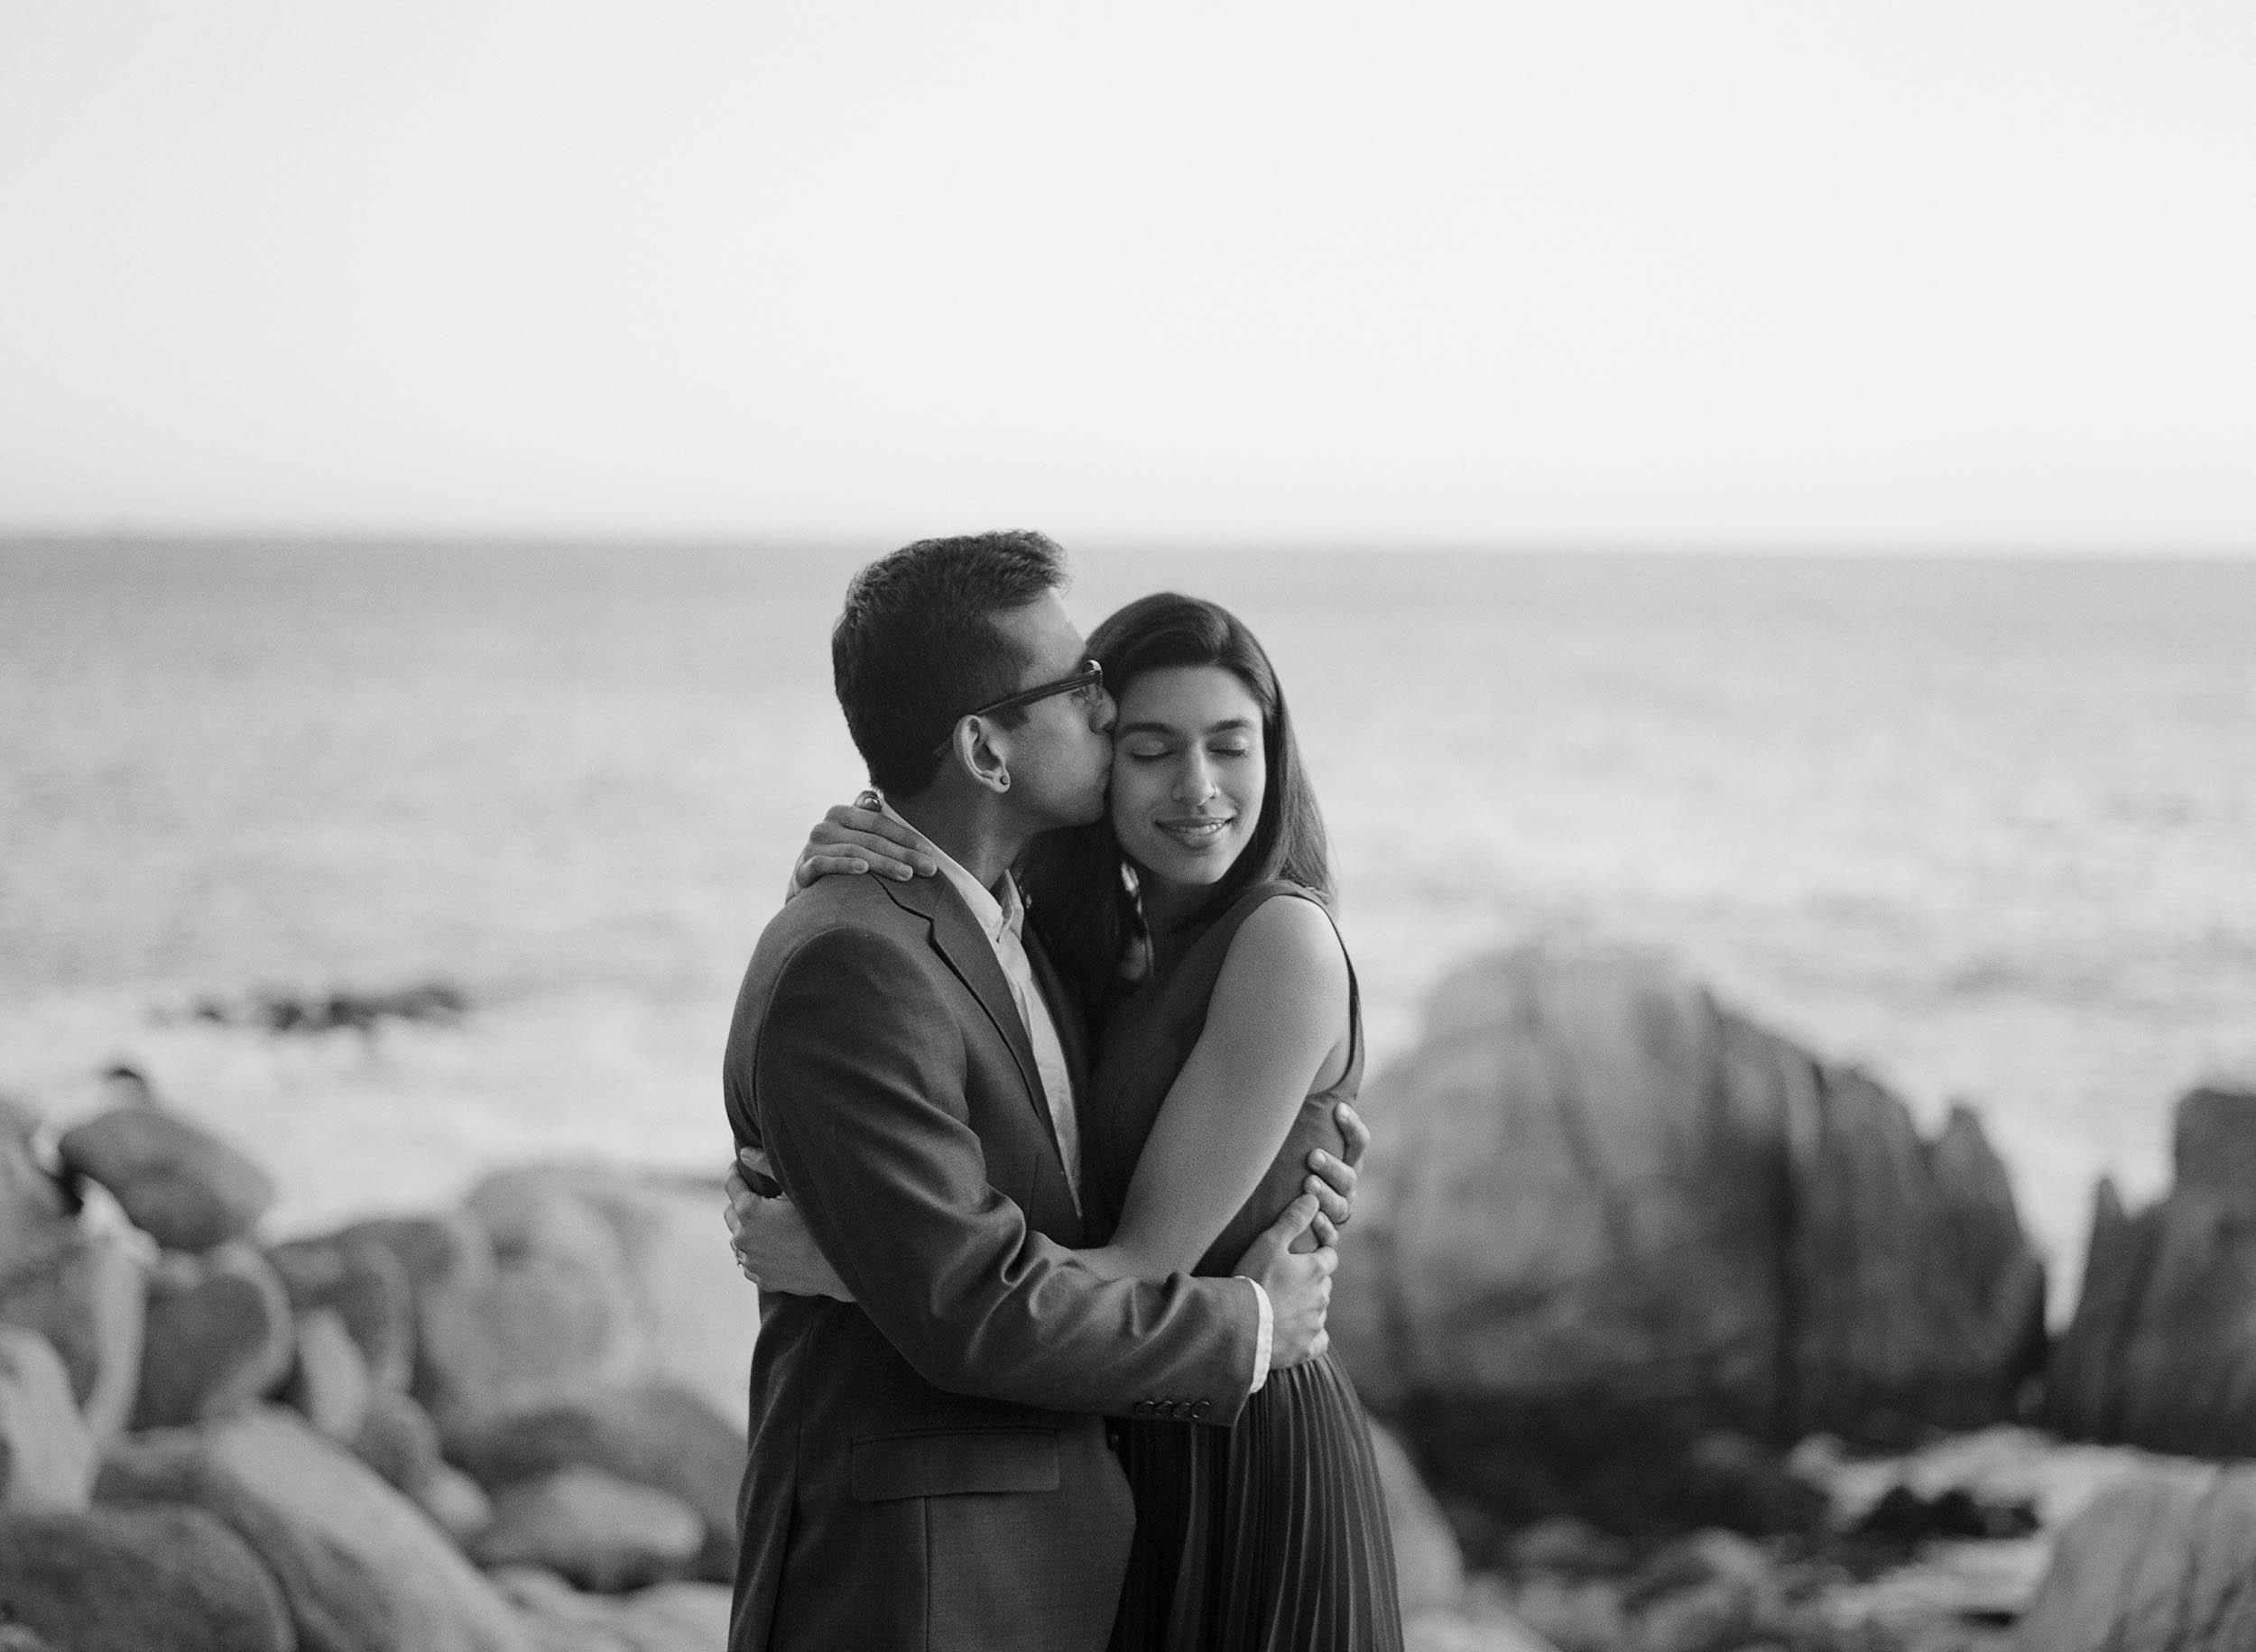 022619_H+Z Engagement_Carmel_Buena Lane Photography_104-2.jpg